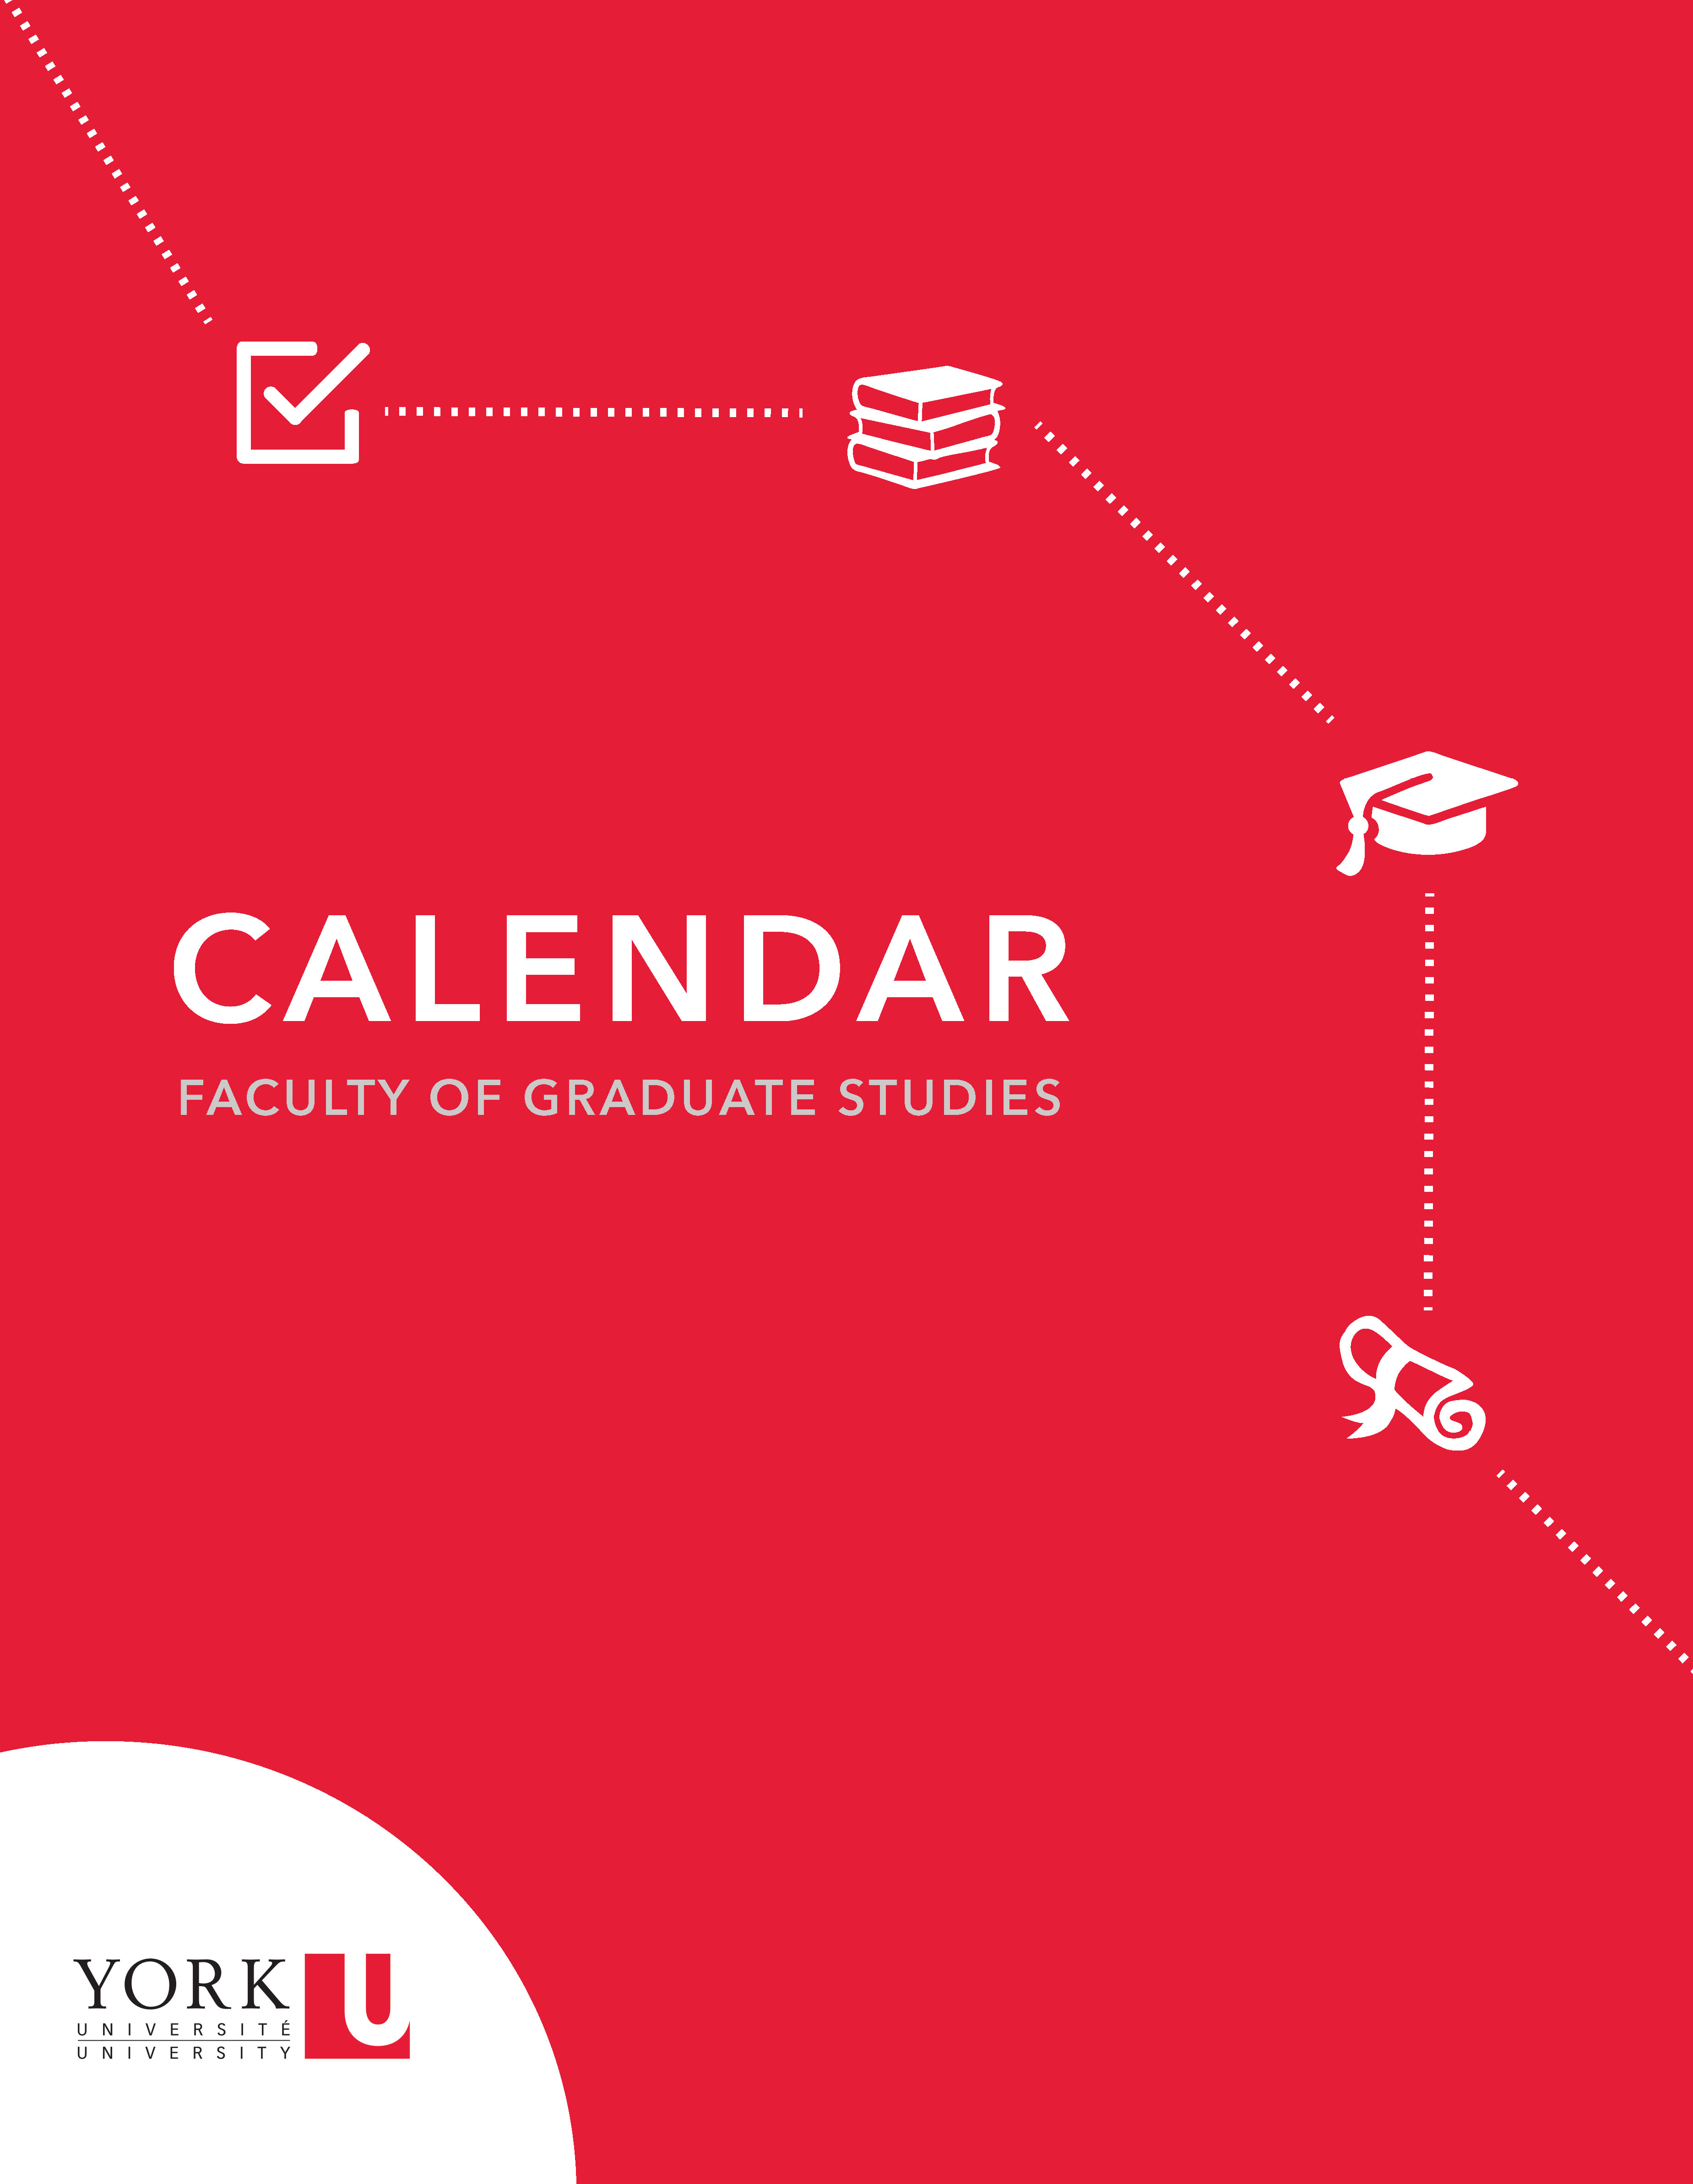 osgoode_calendar_facultyofgraduatestudies